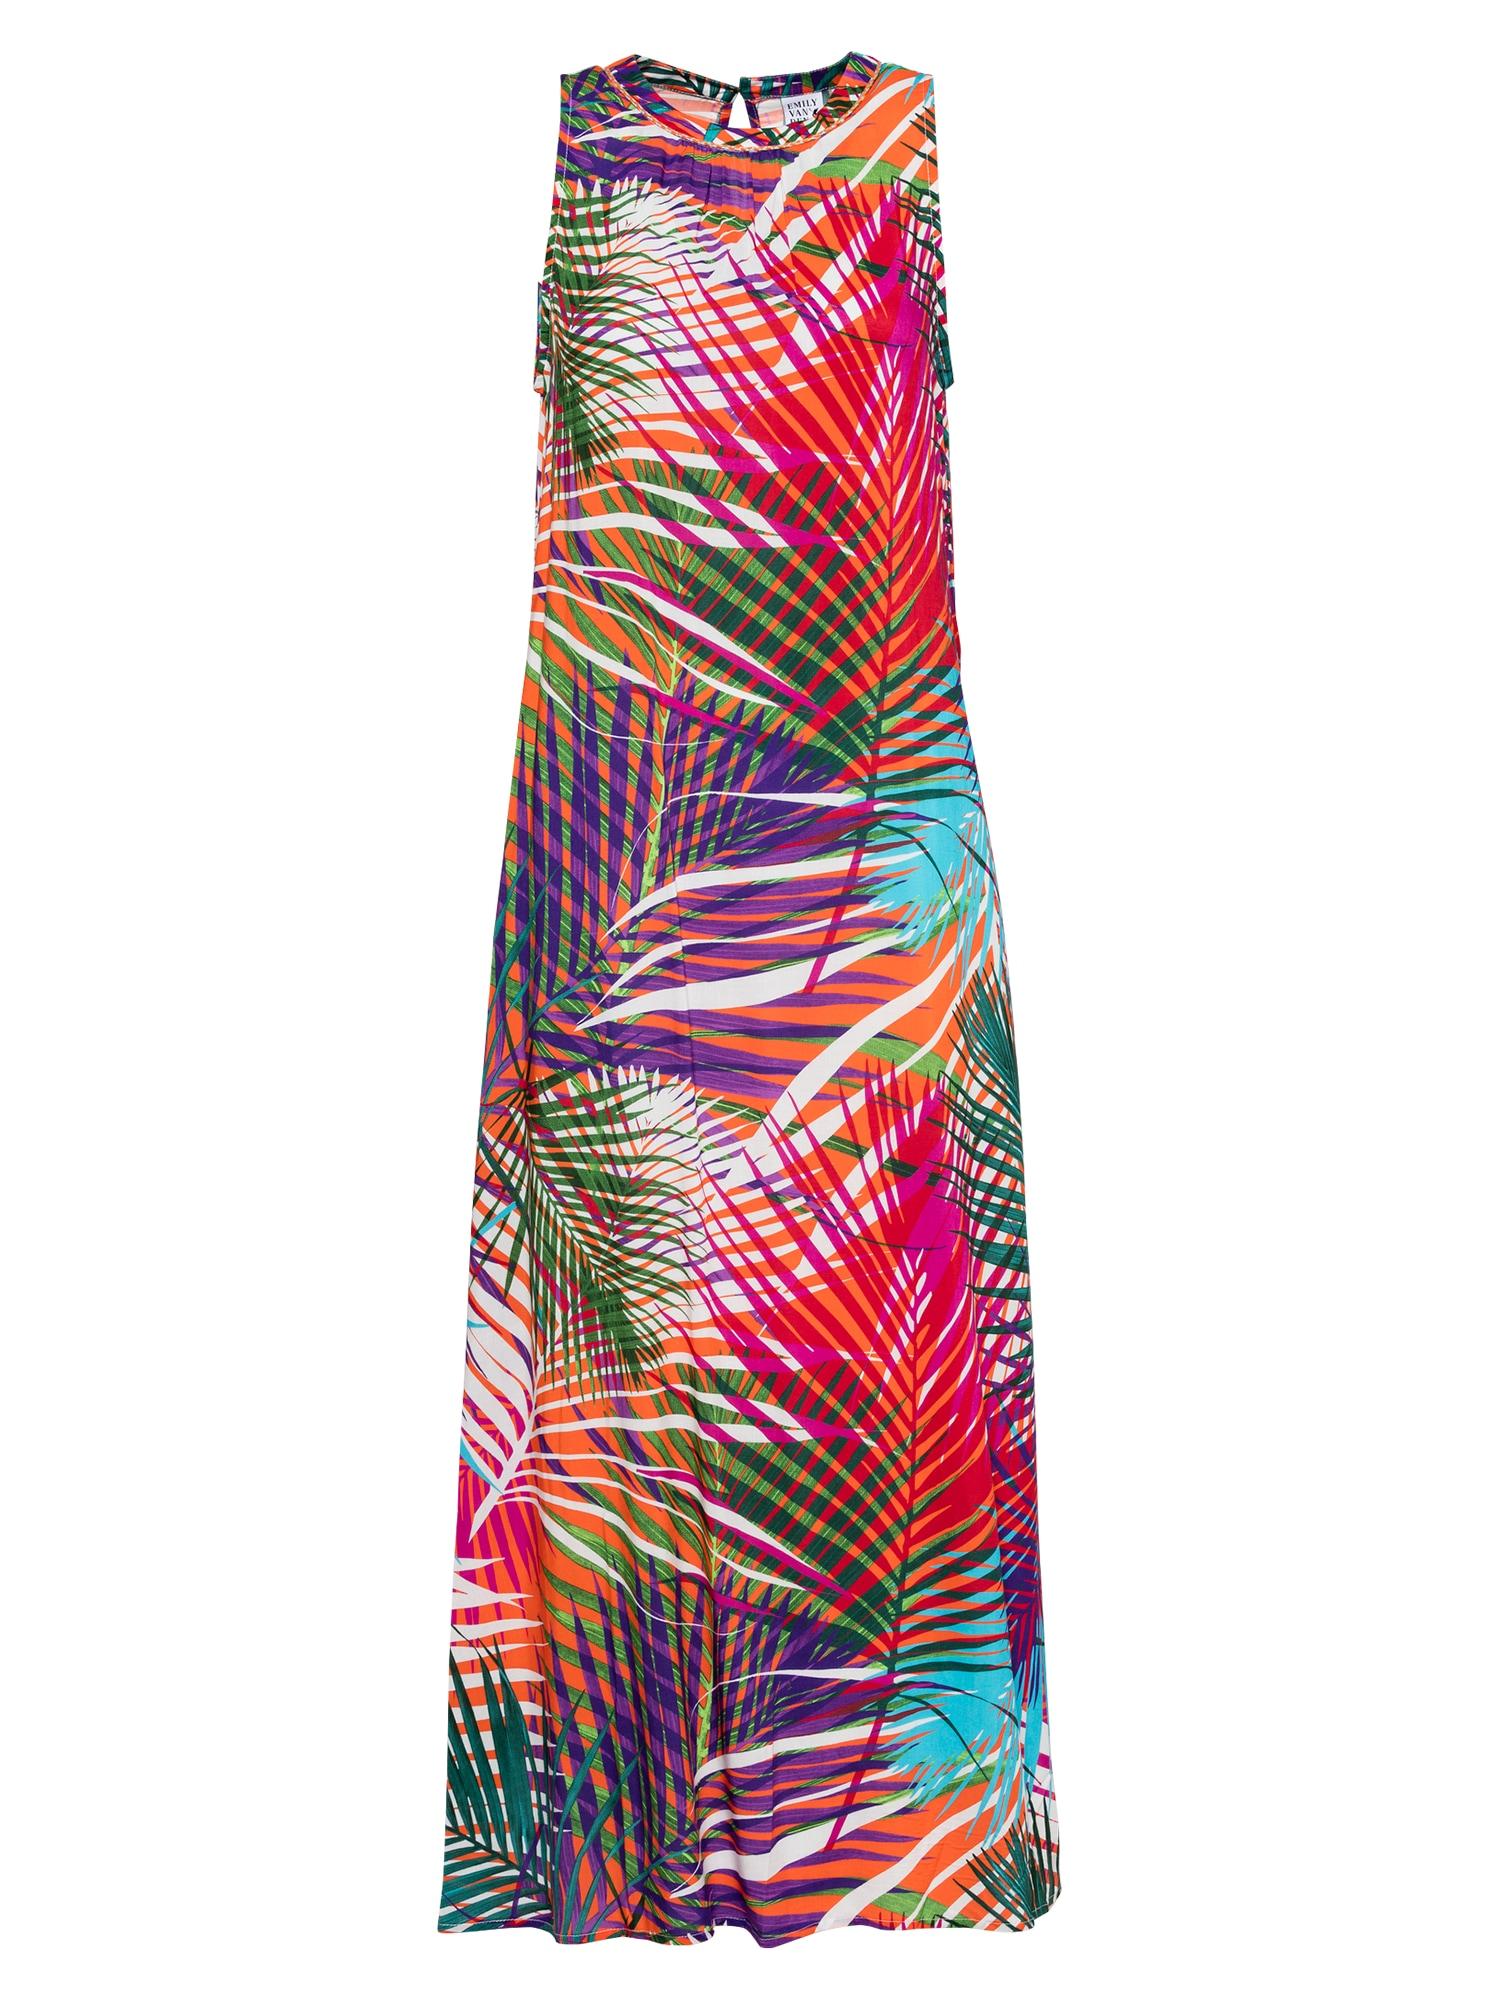 Emily Van Den Bergh Suknelė mišrios spalvos